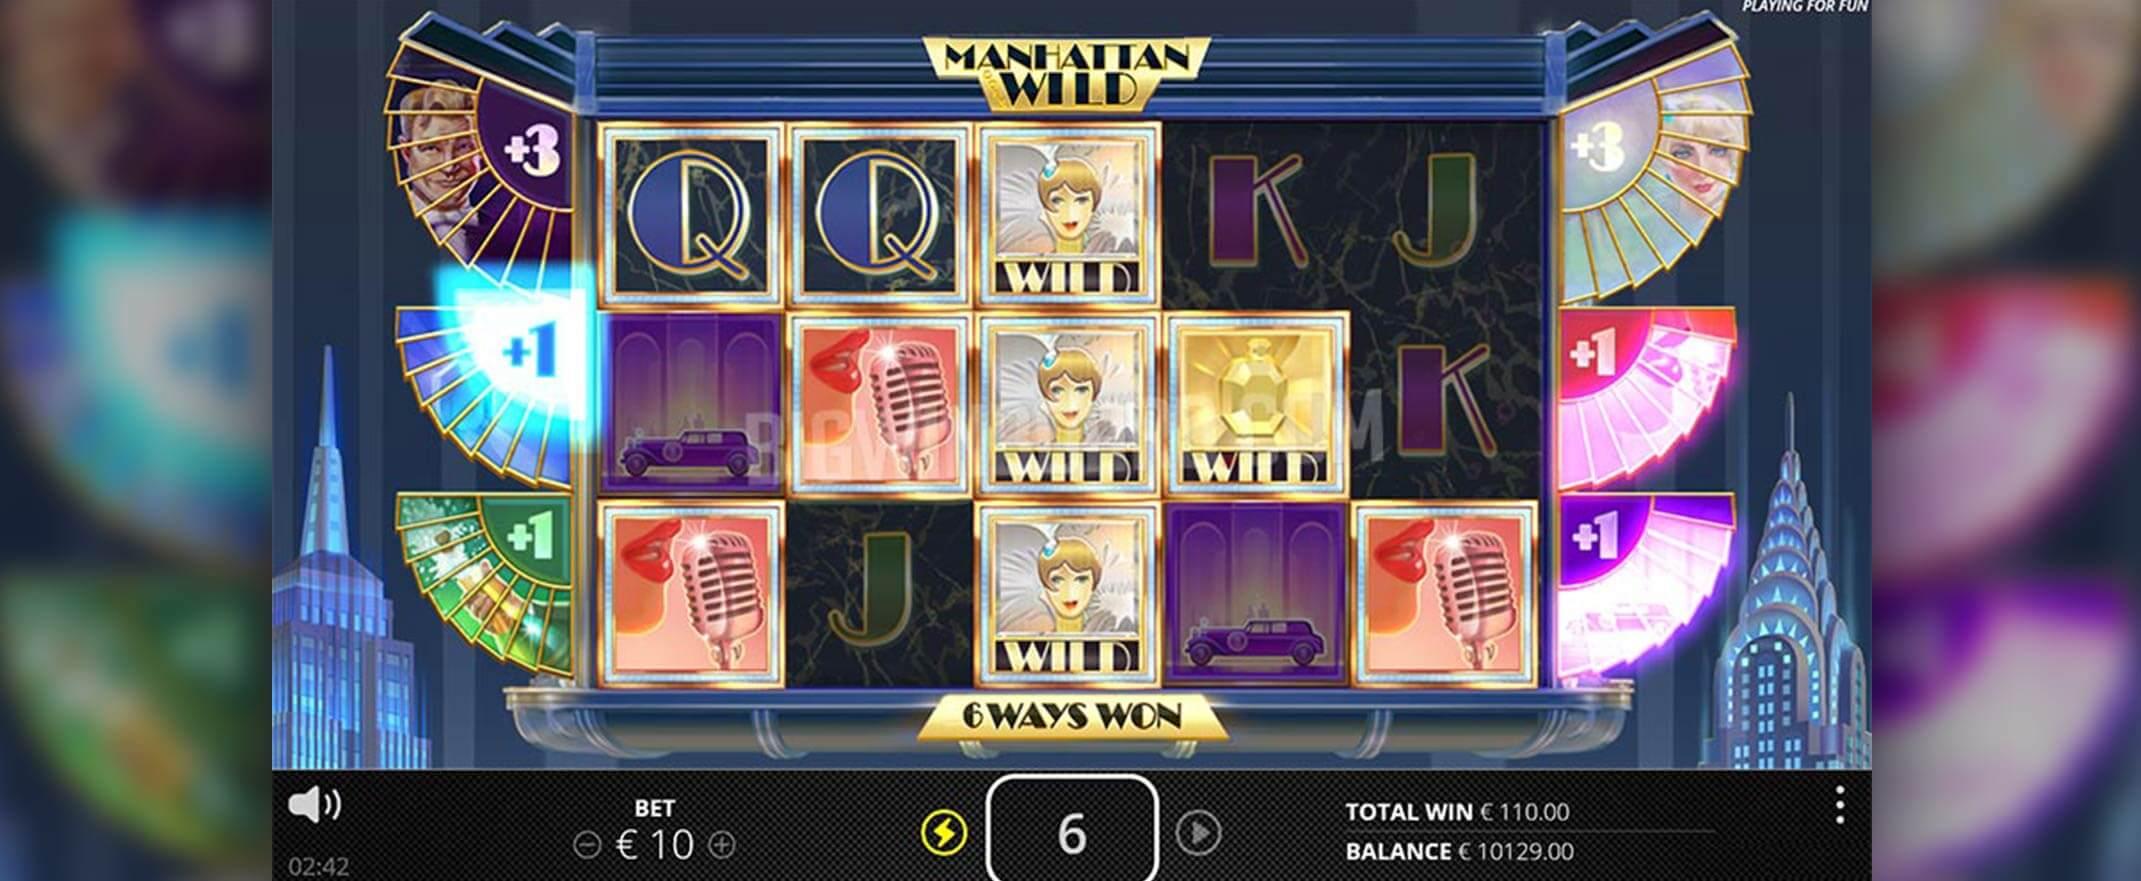 Manhattan Goes Wild Slot Gameplay